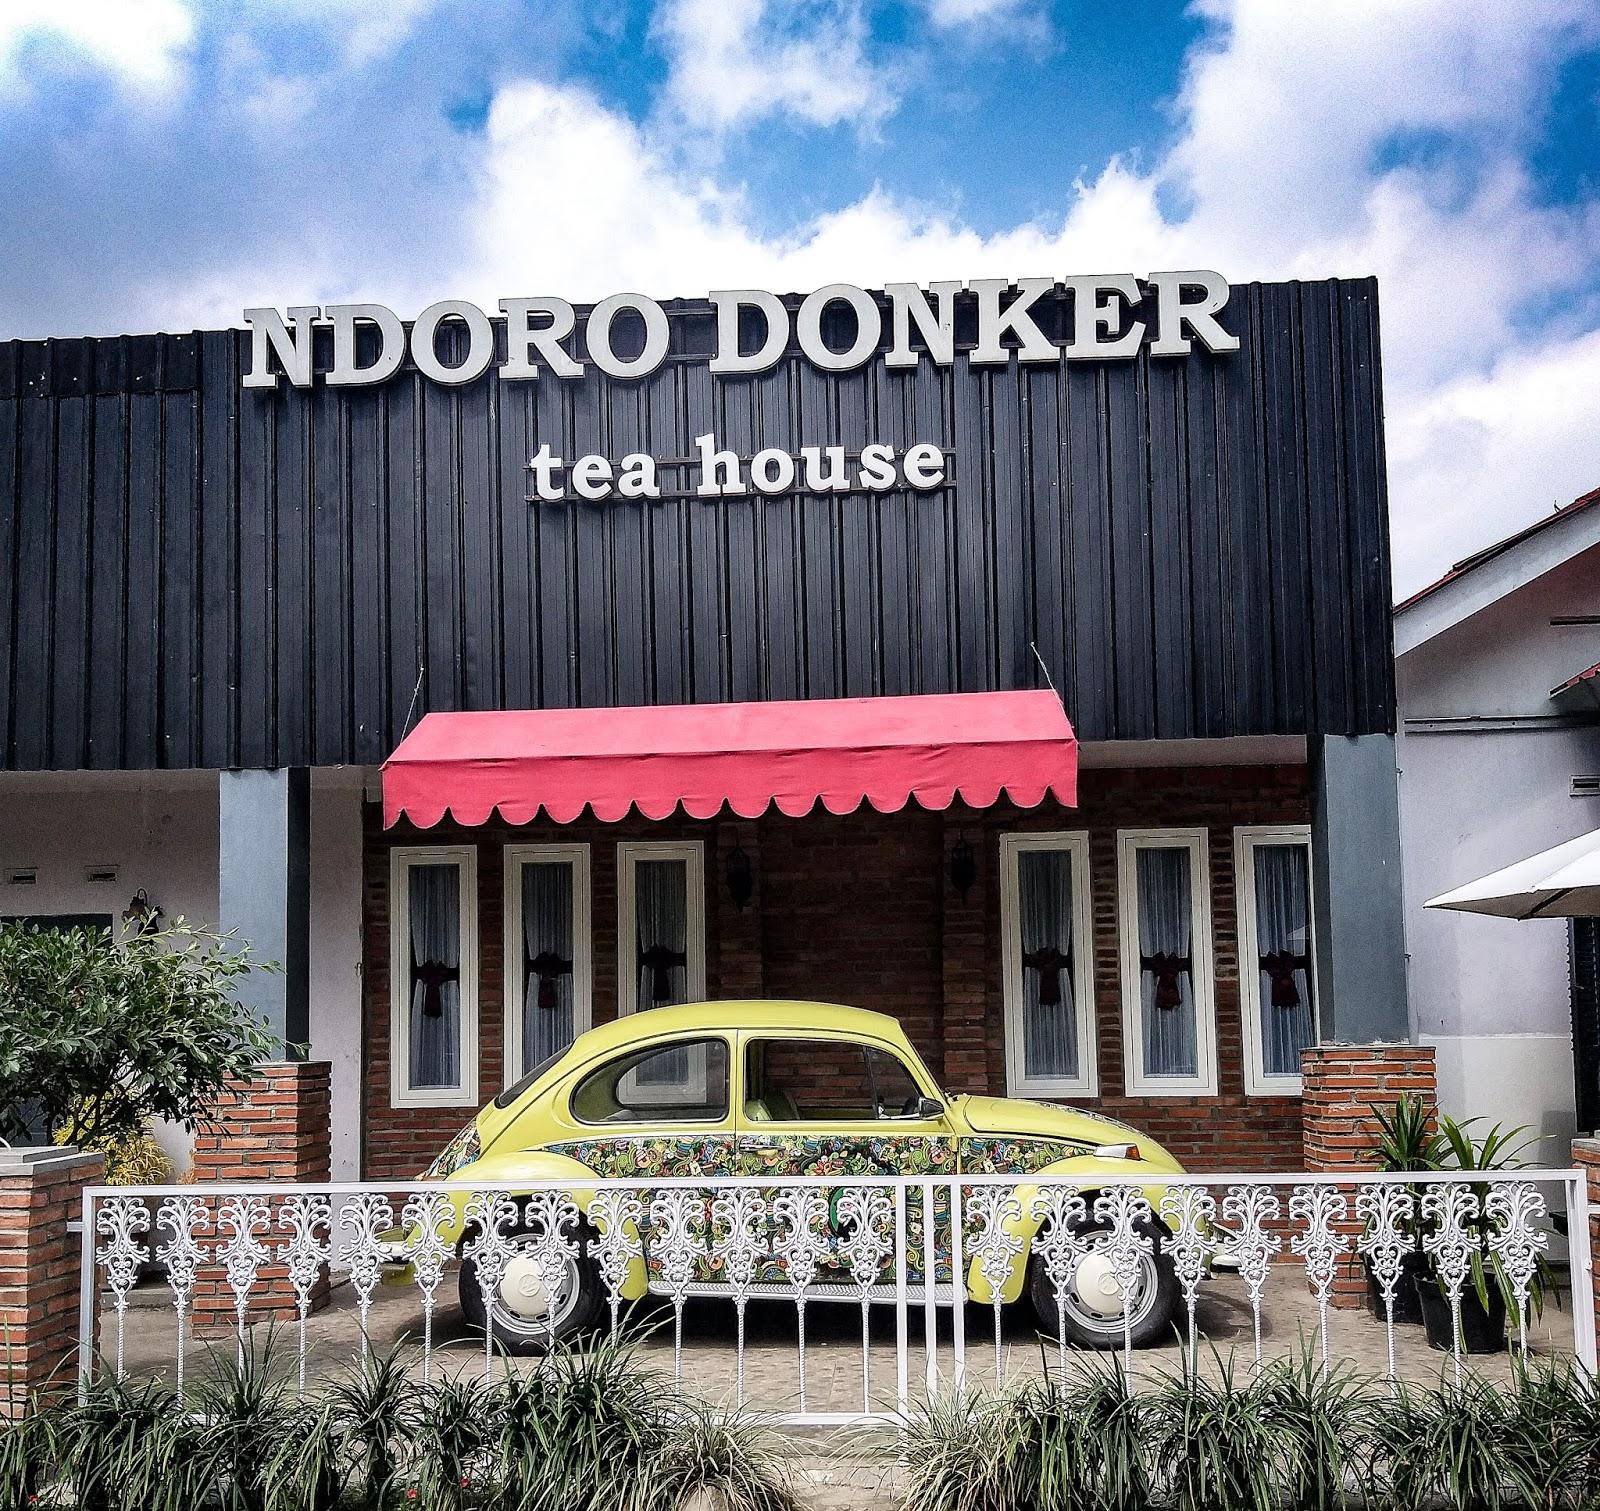 Ndoro Donker Tea House